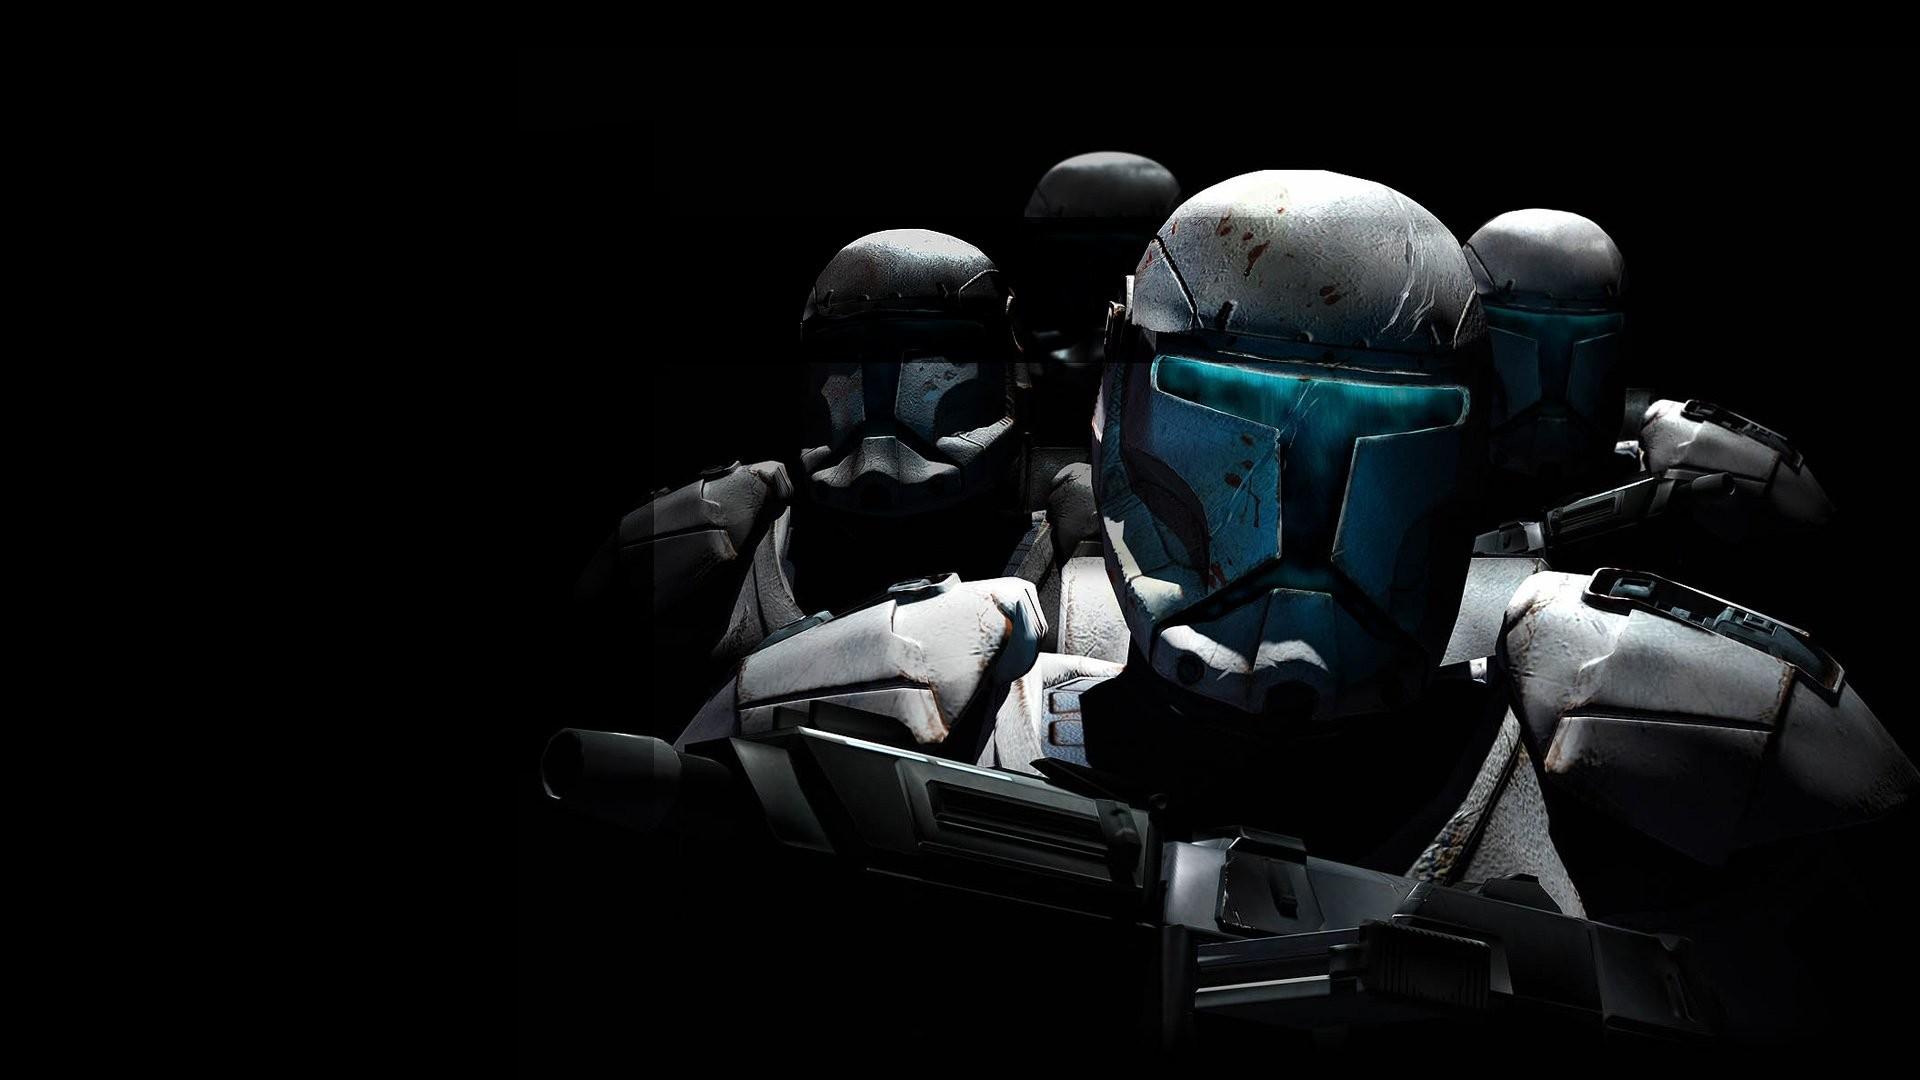 30+ Clone Trooper Wallpaper Iphone Pictures